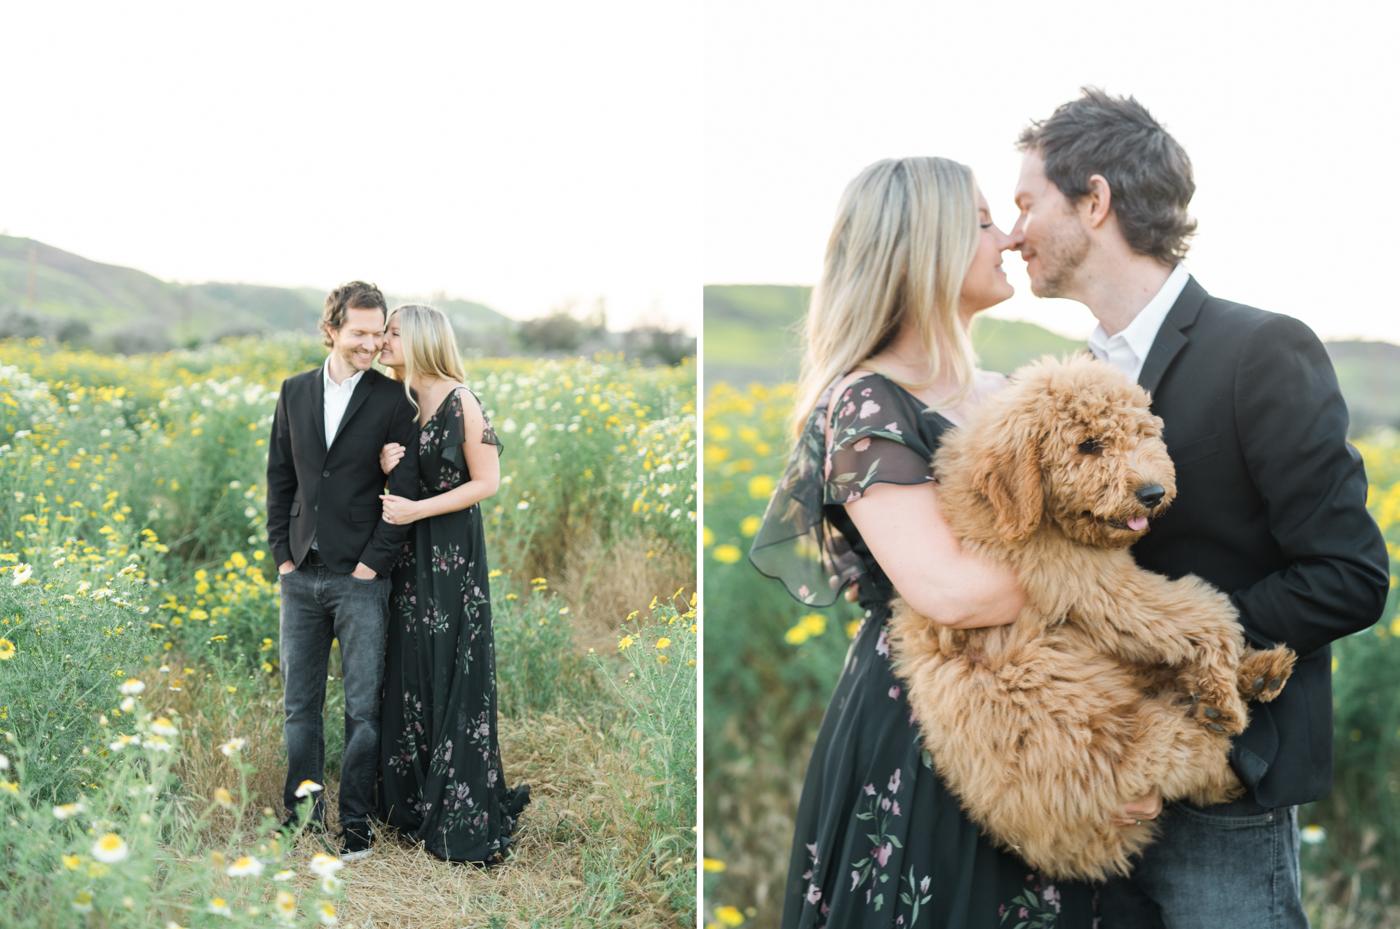 San_Juan_Capistrano_Goldendoodle_family_portrait_session_los_angeles_wedding_photographer-26.jpg